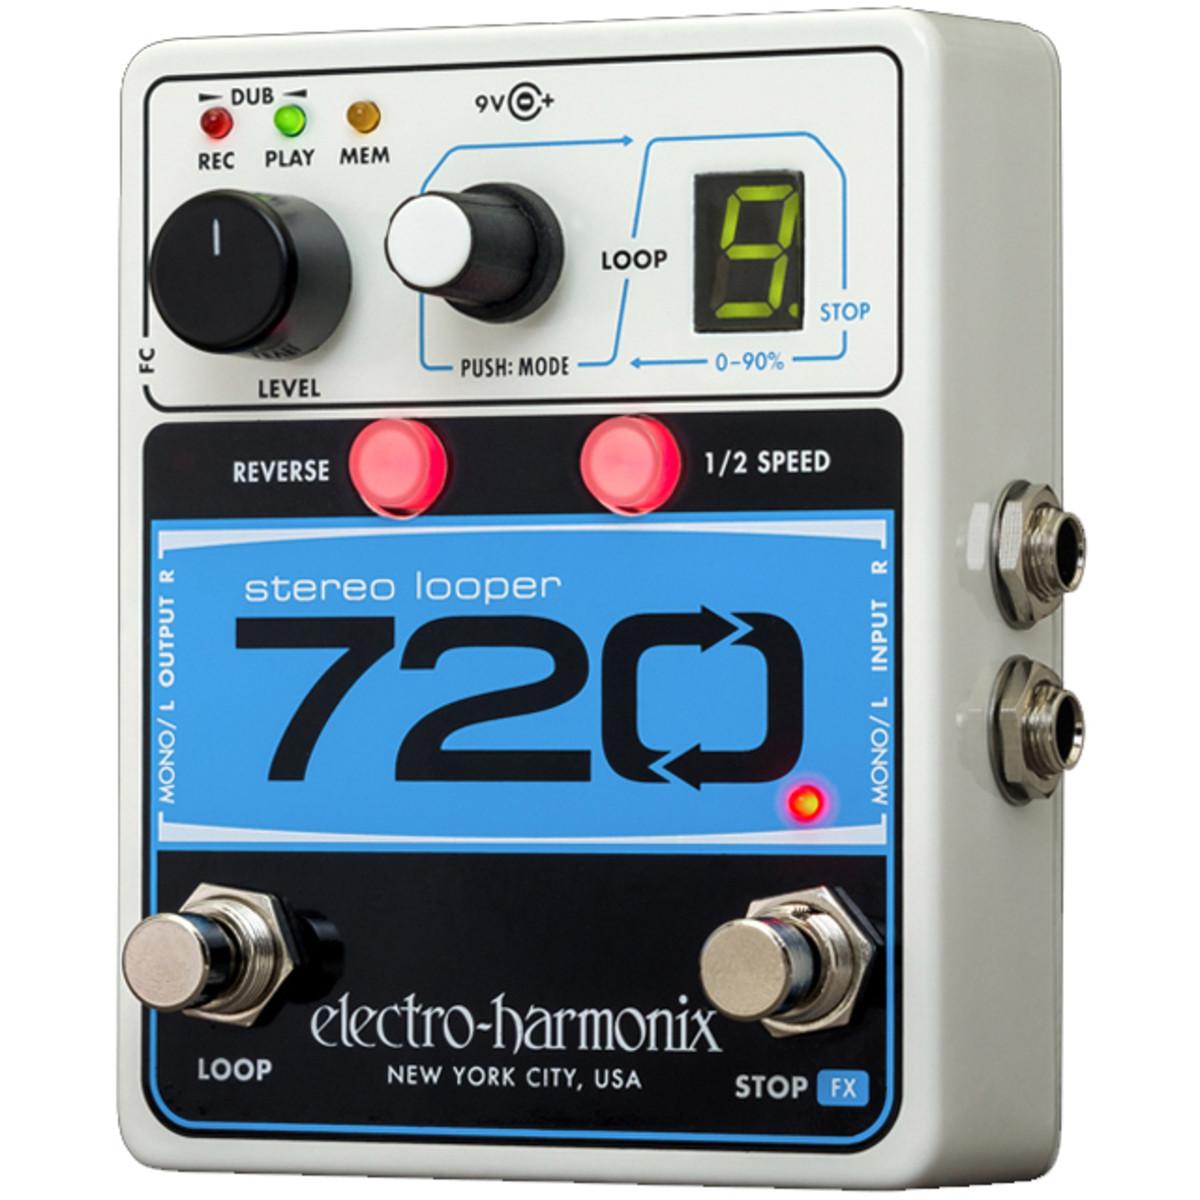 Image of Electro Harmonix 720 Stereo Looper Pedal